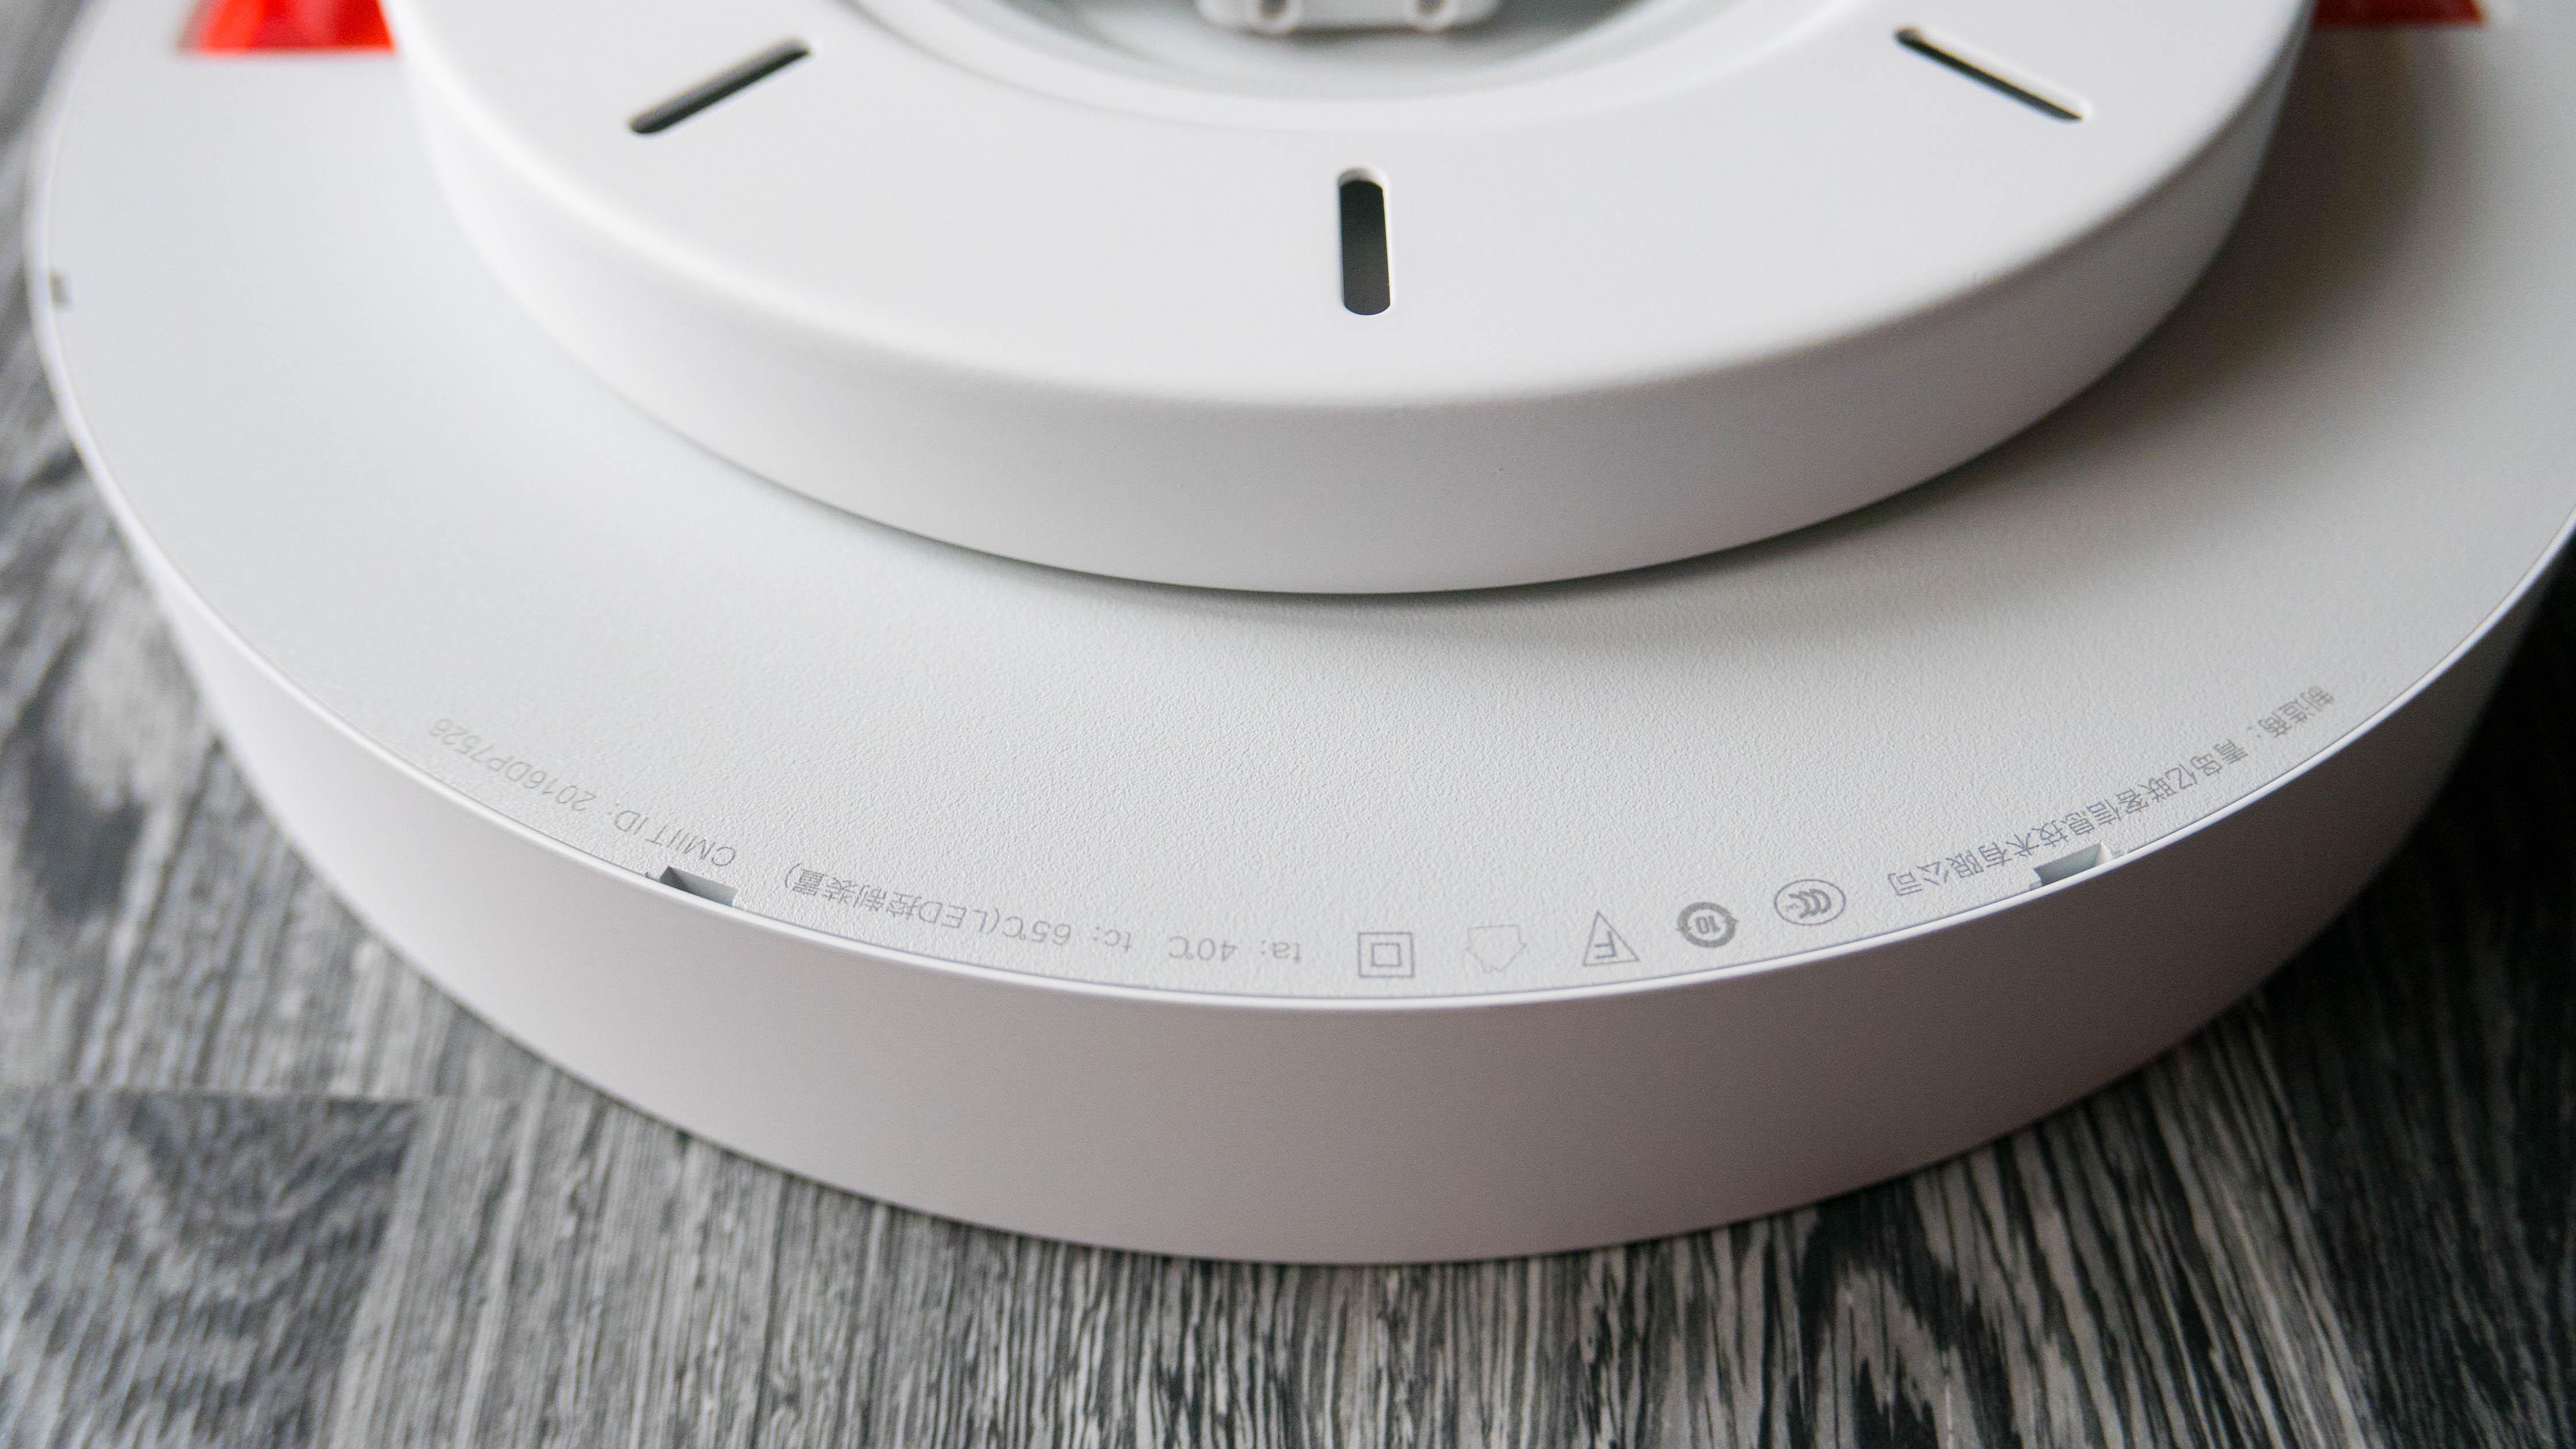 Xiaomi Yeelight LED Ceiling Light 8